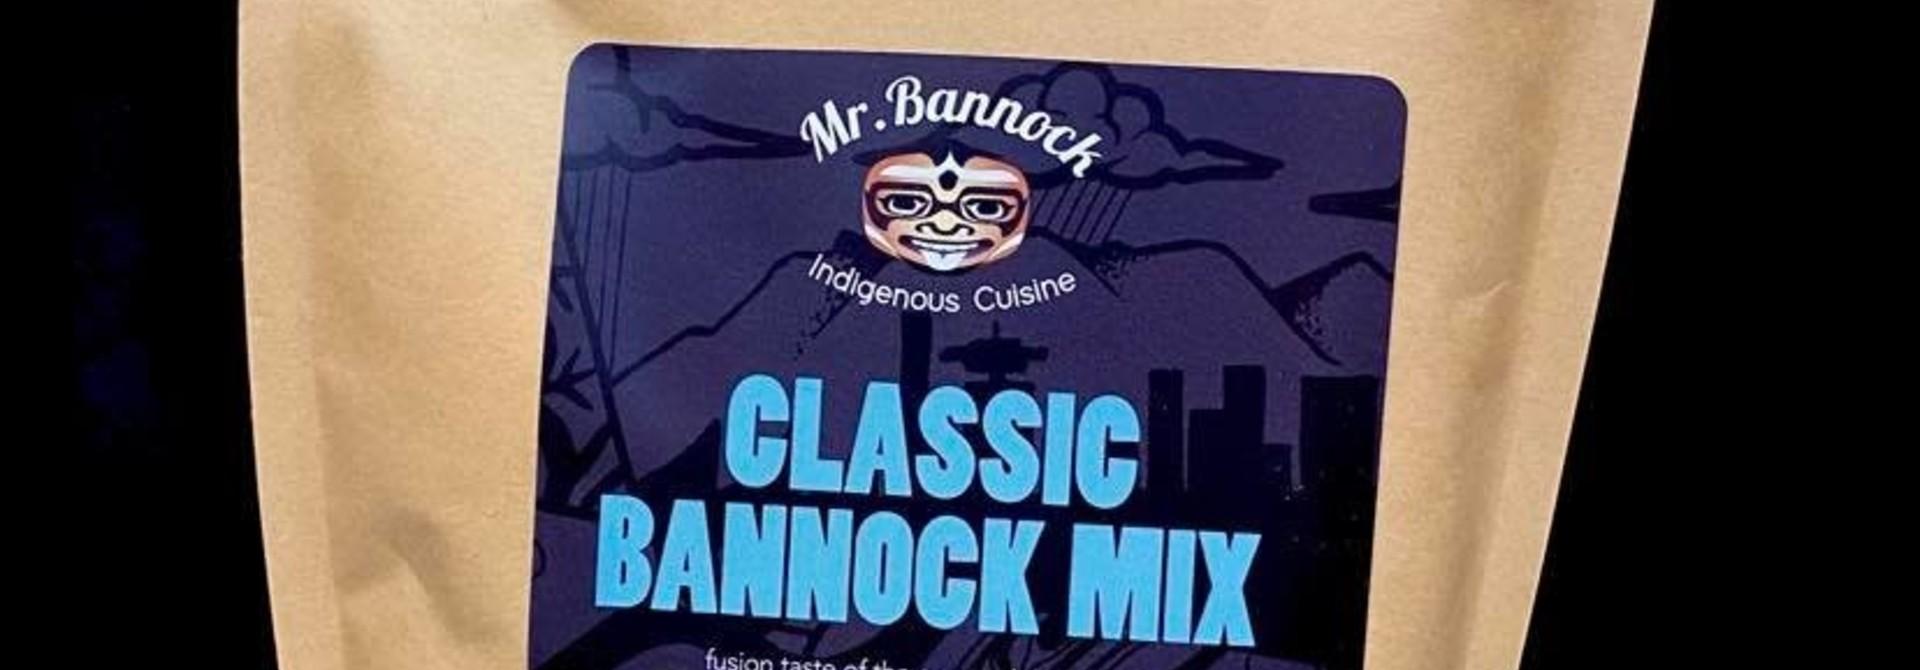 Mr. Bannock classic Bannock Mix 900g pkg